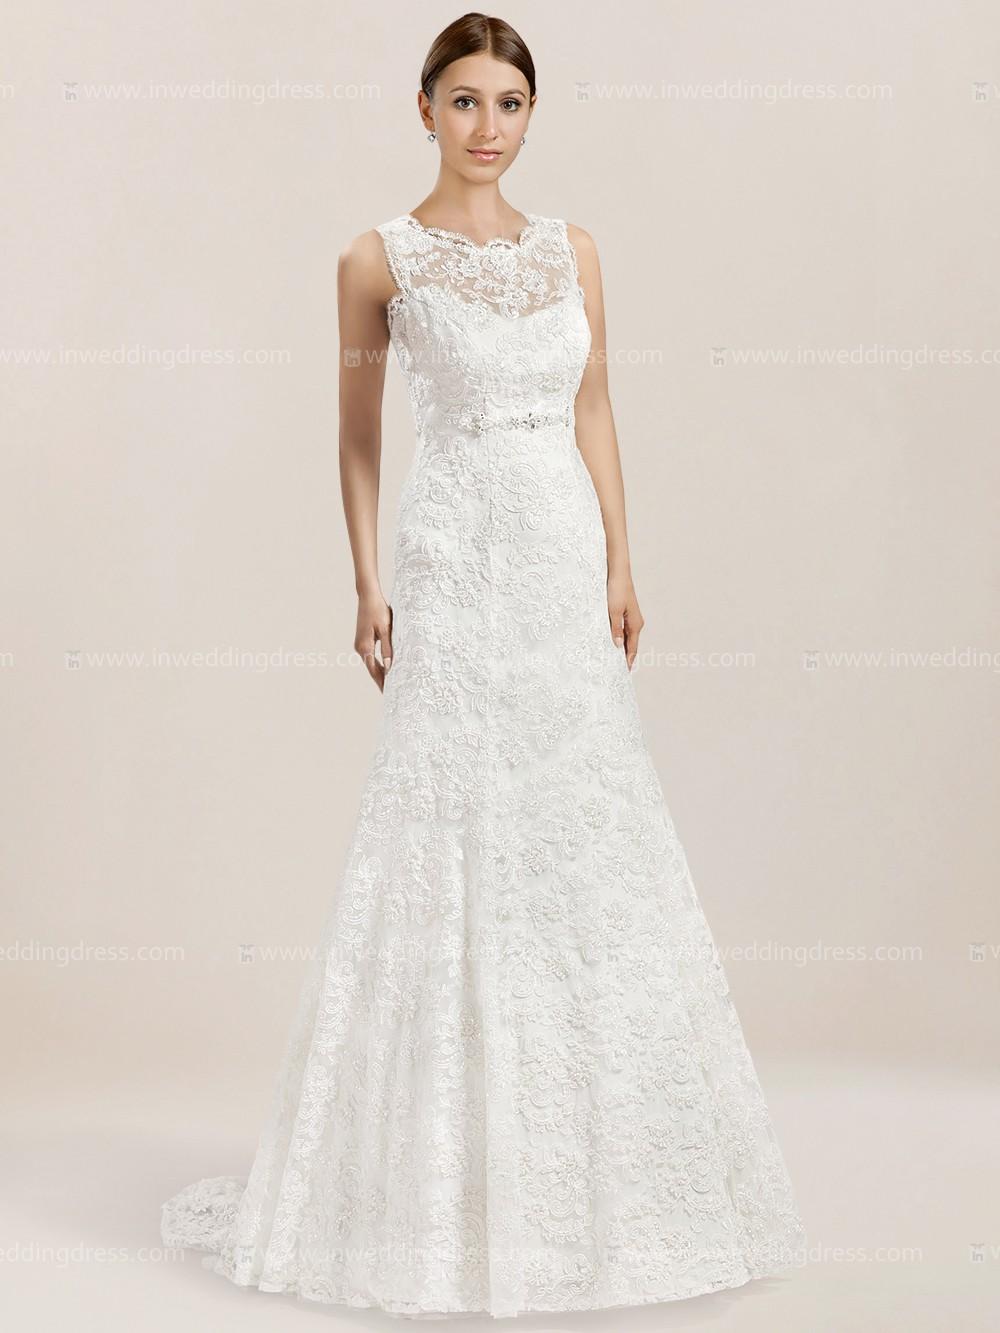 swedish wedding dresses photo - 1